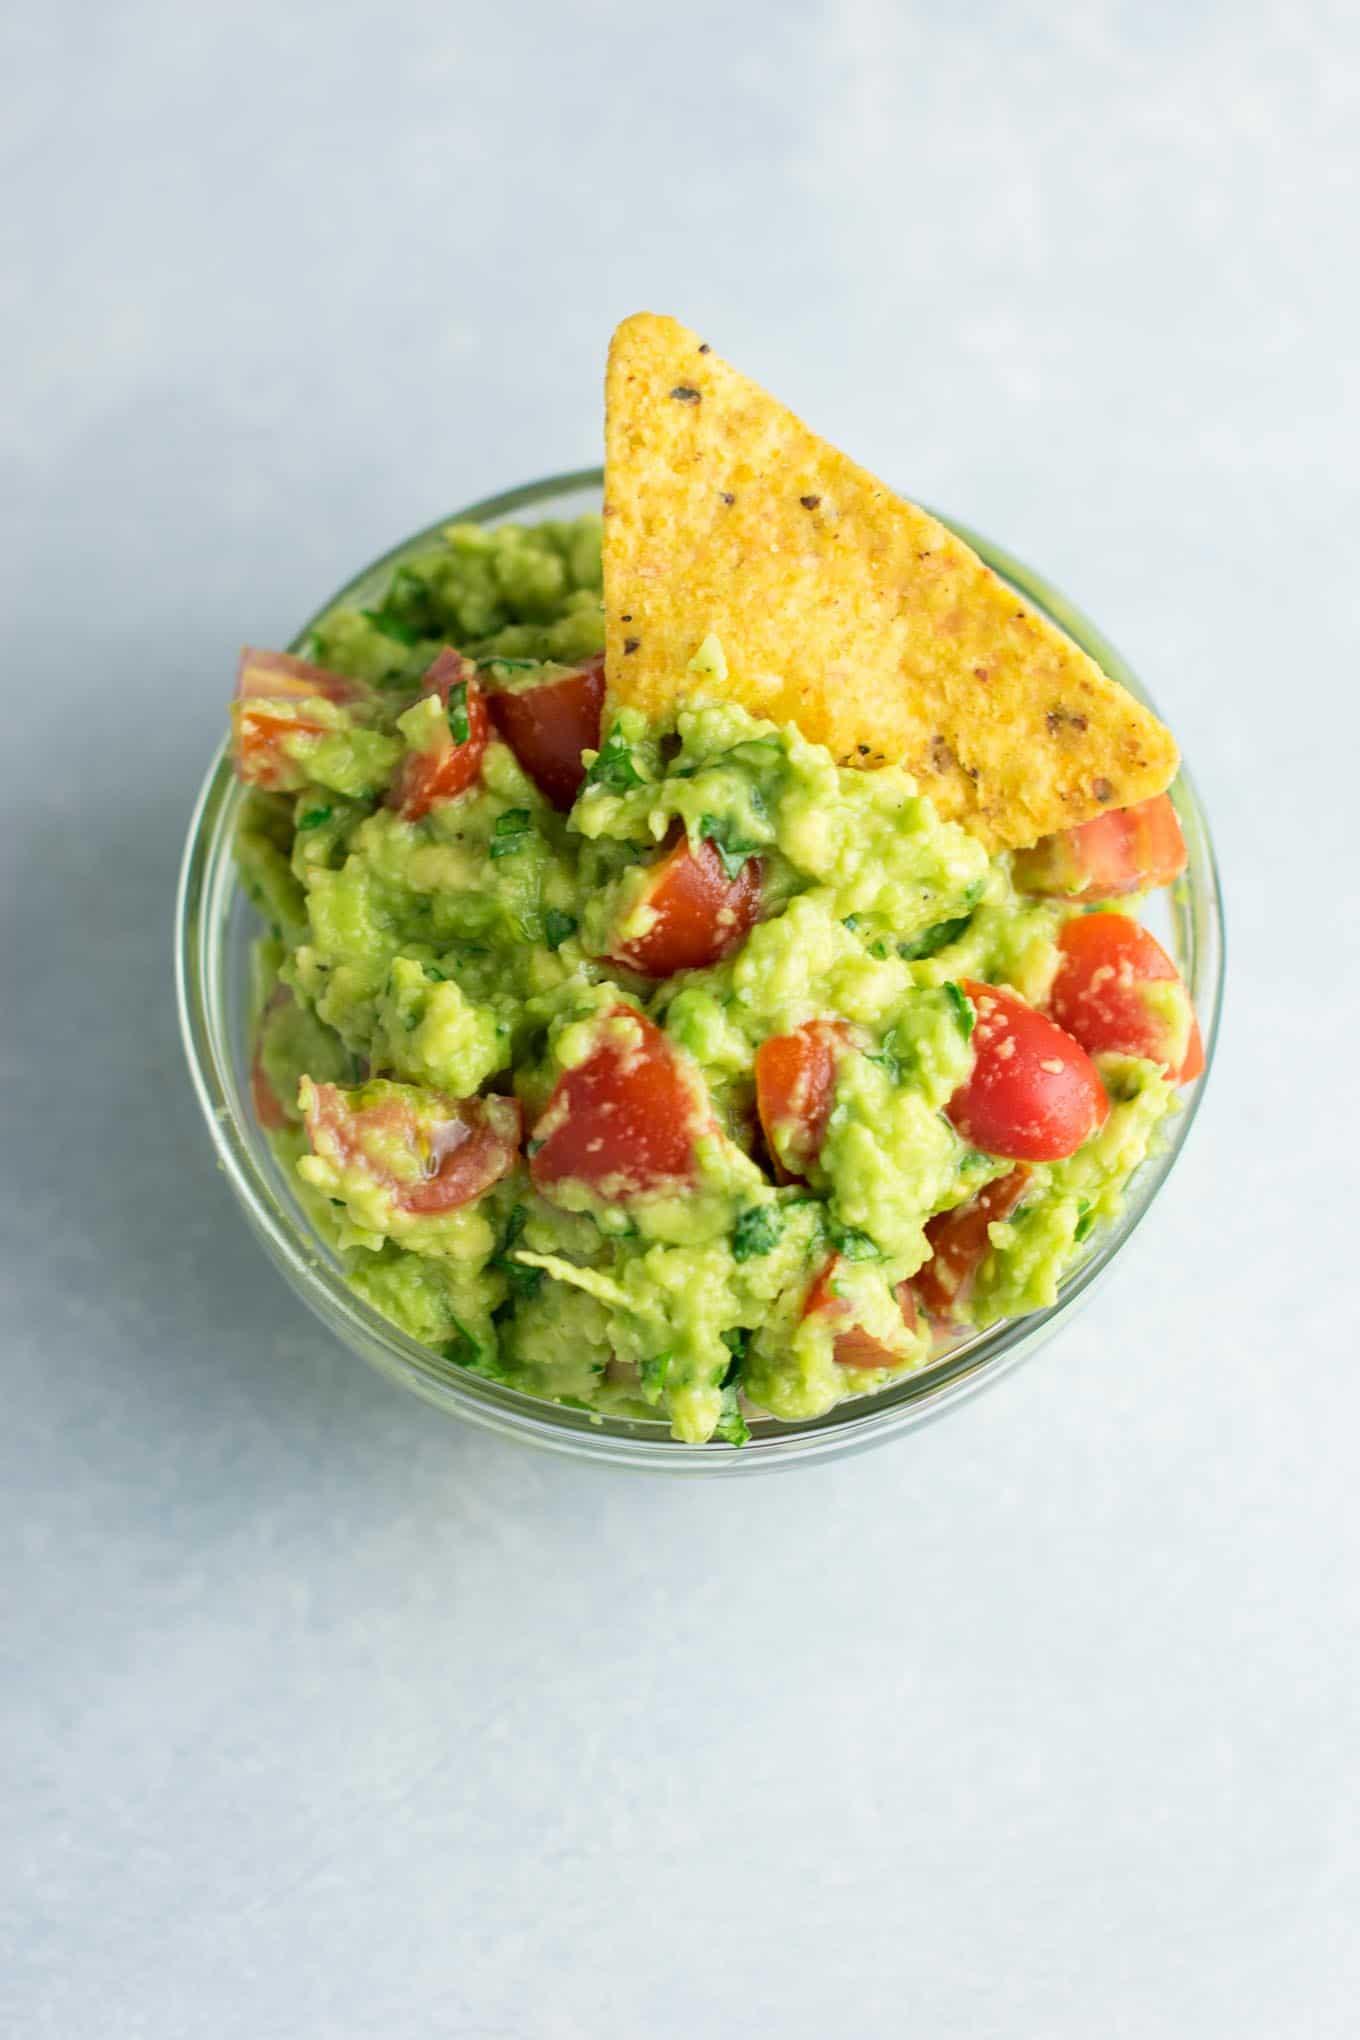 Easy guacamole recipe. #vegan #guacamole #bestguacamole #appetizers #gamedayfood